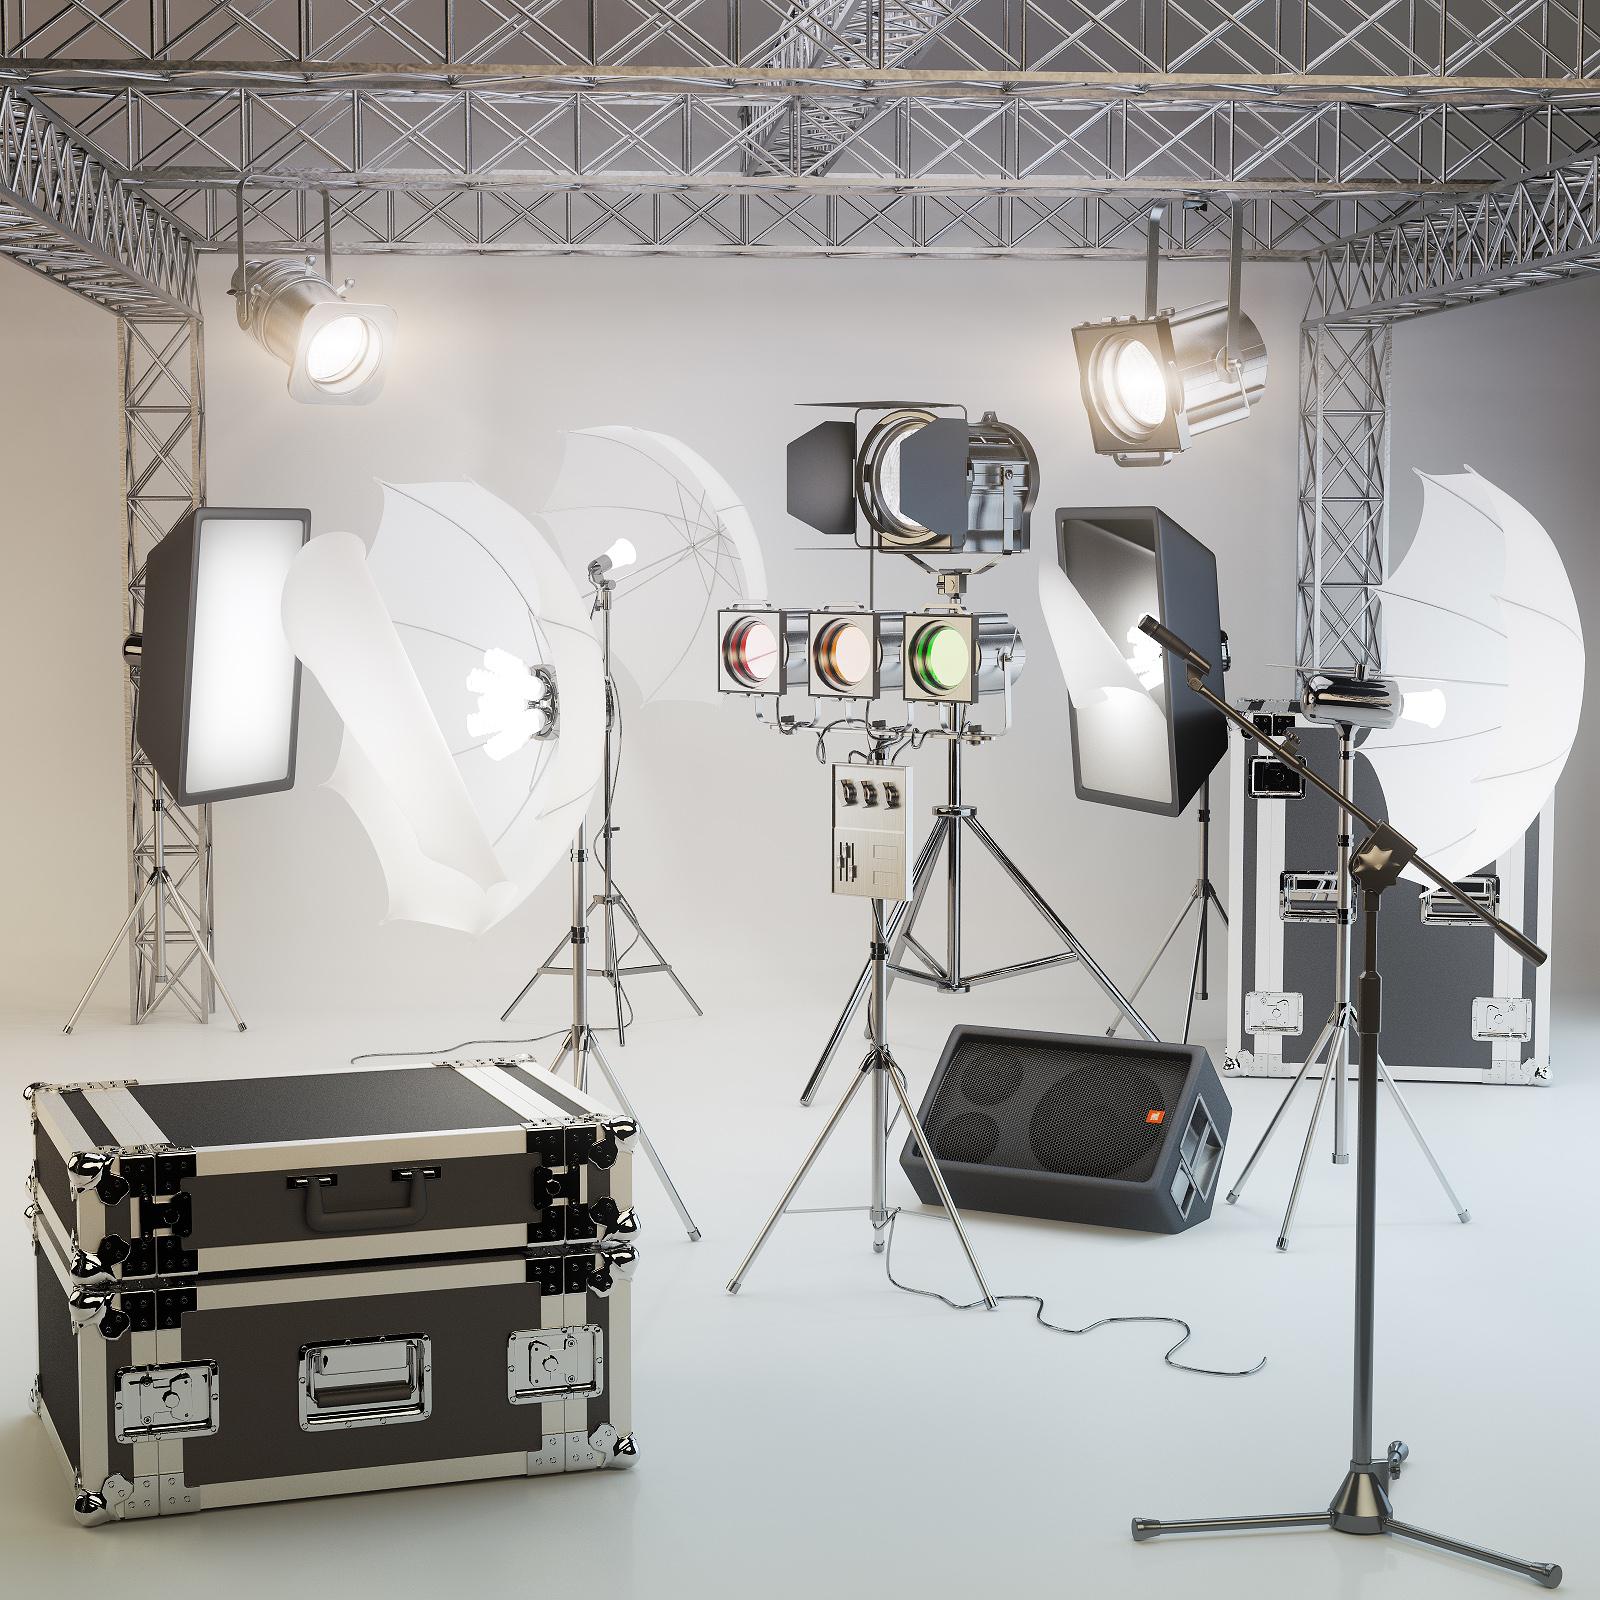 lighting studios suitcases microphone max https://static.turbosquid.com/Preview/2014/10/06__11_29_45/PhotoMusicAcessories.JPG423423b1-2b37-482a-a1ab-12dc3ac1a431Original.jpg